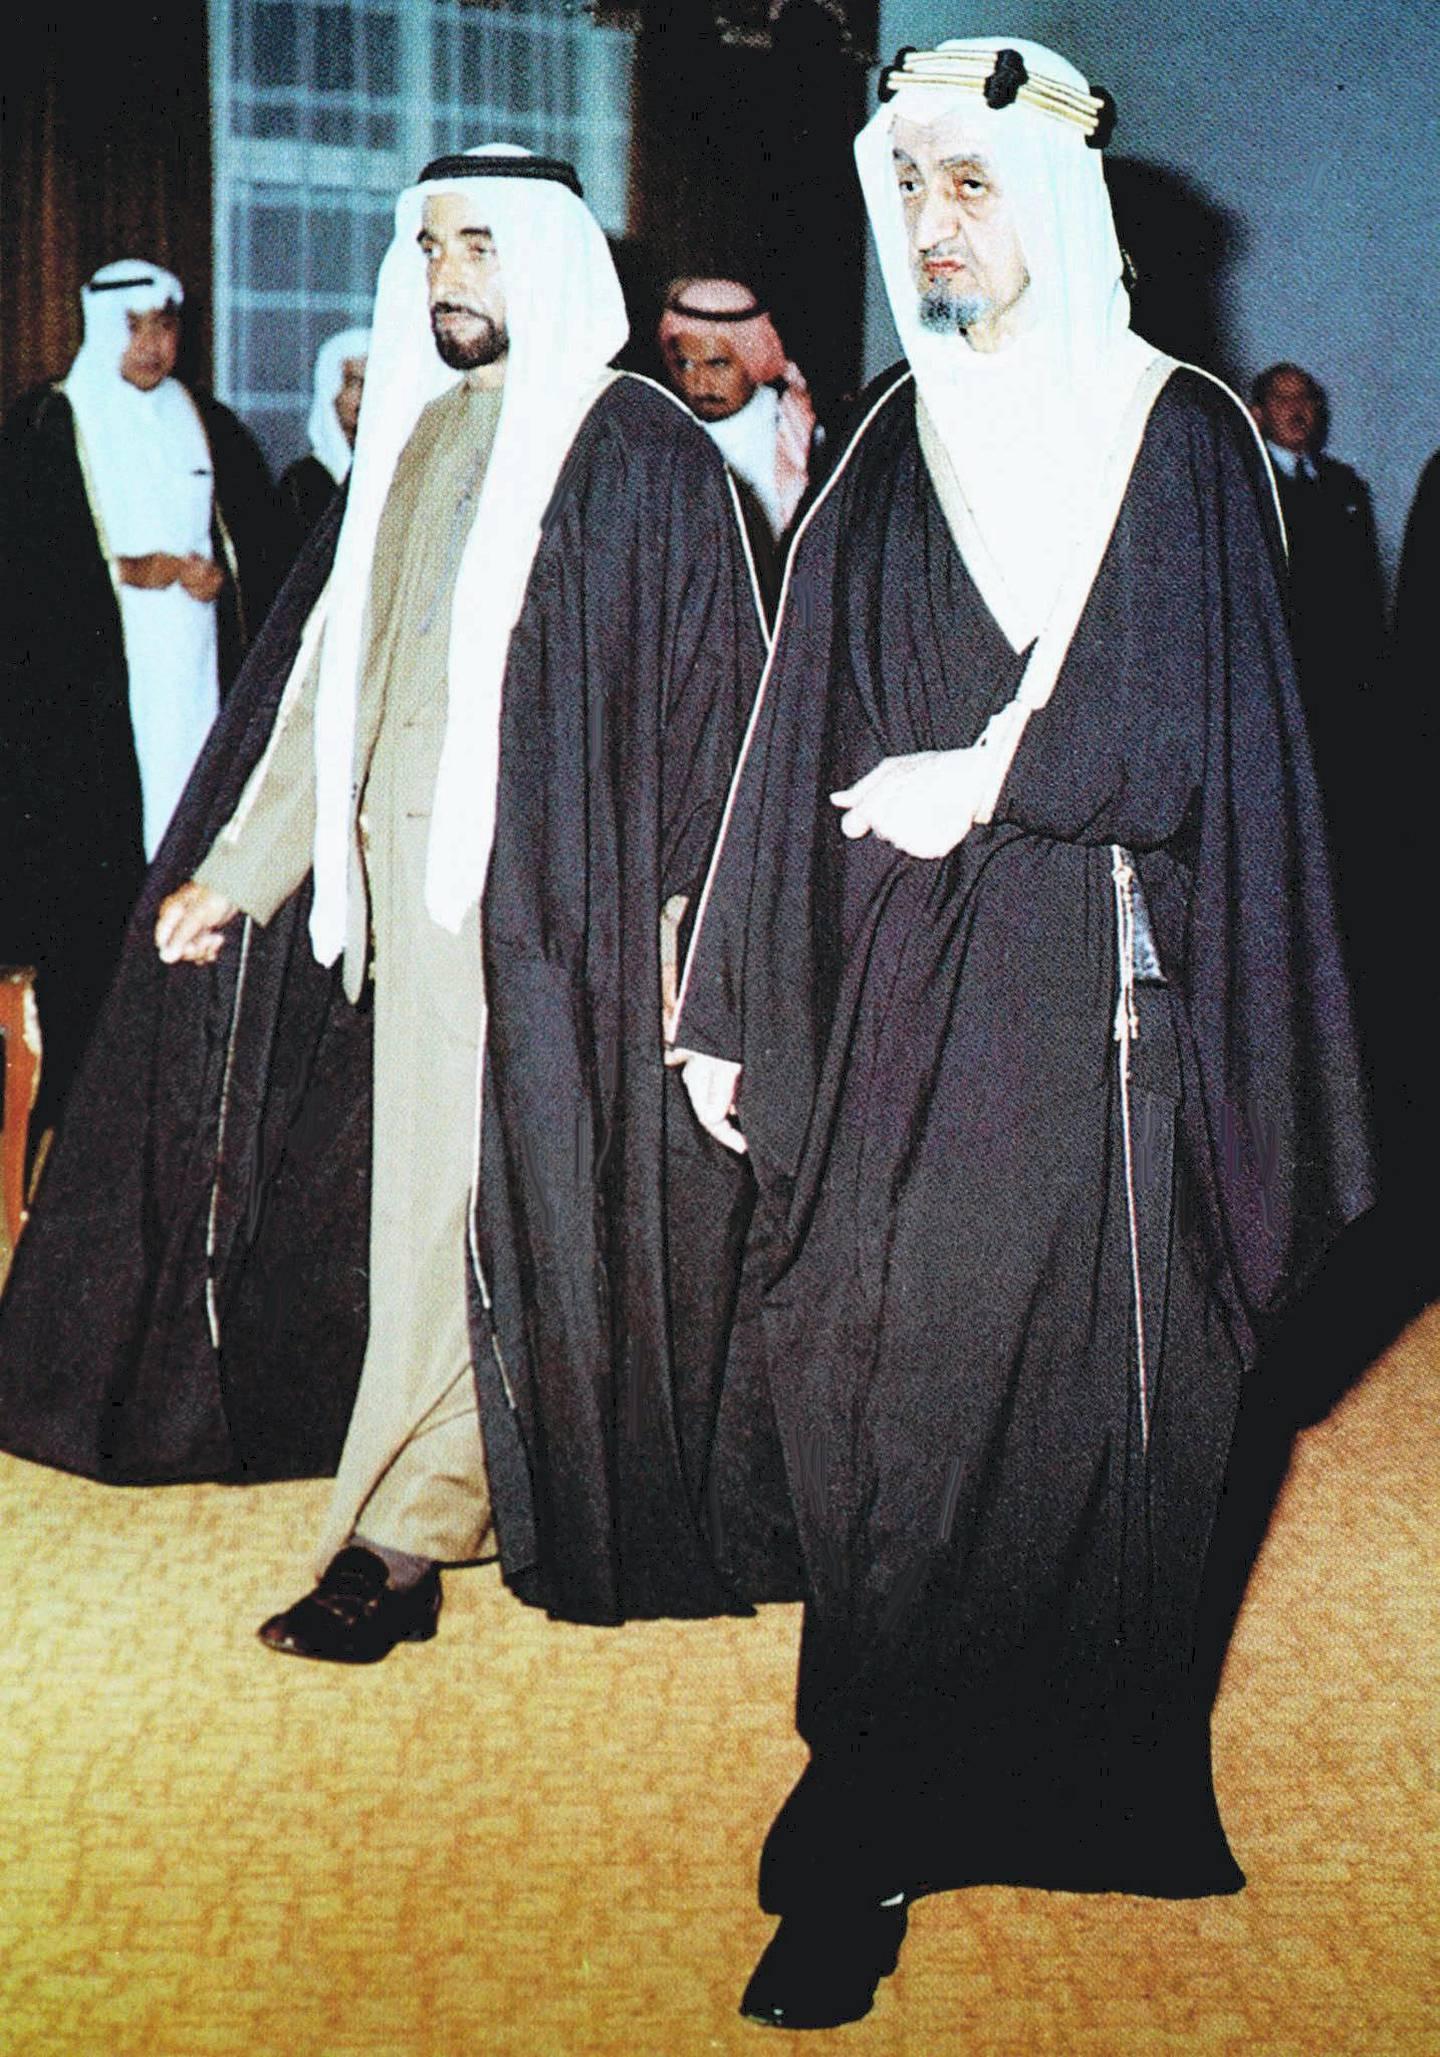 UAE President Sheikh Zayed Ben Sultan al-Nahyan (L) meets Saudi King Faisal in Riyadh in February 1975. / AFP PHOTO / WAM